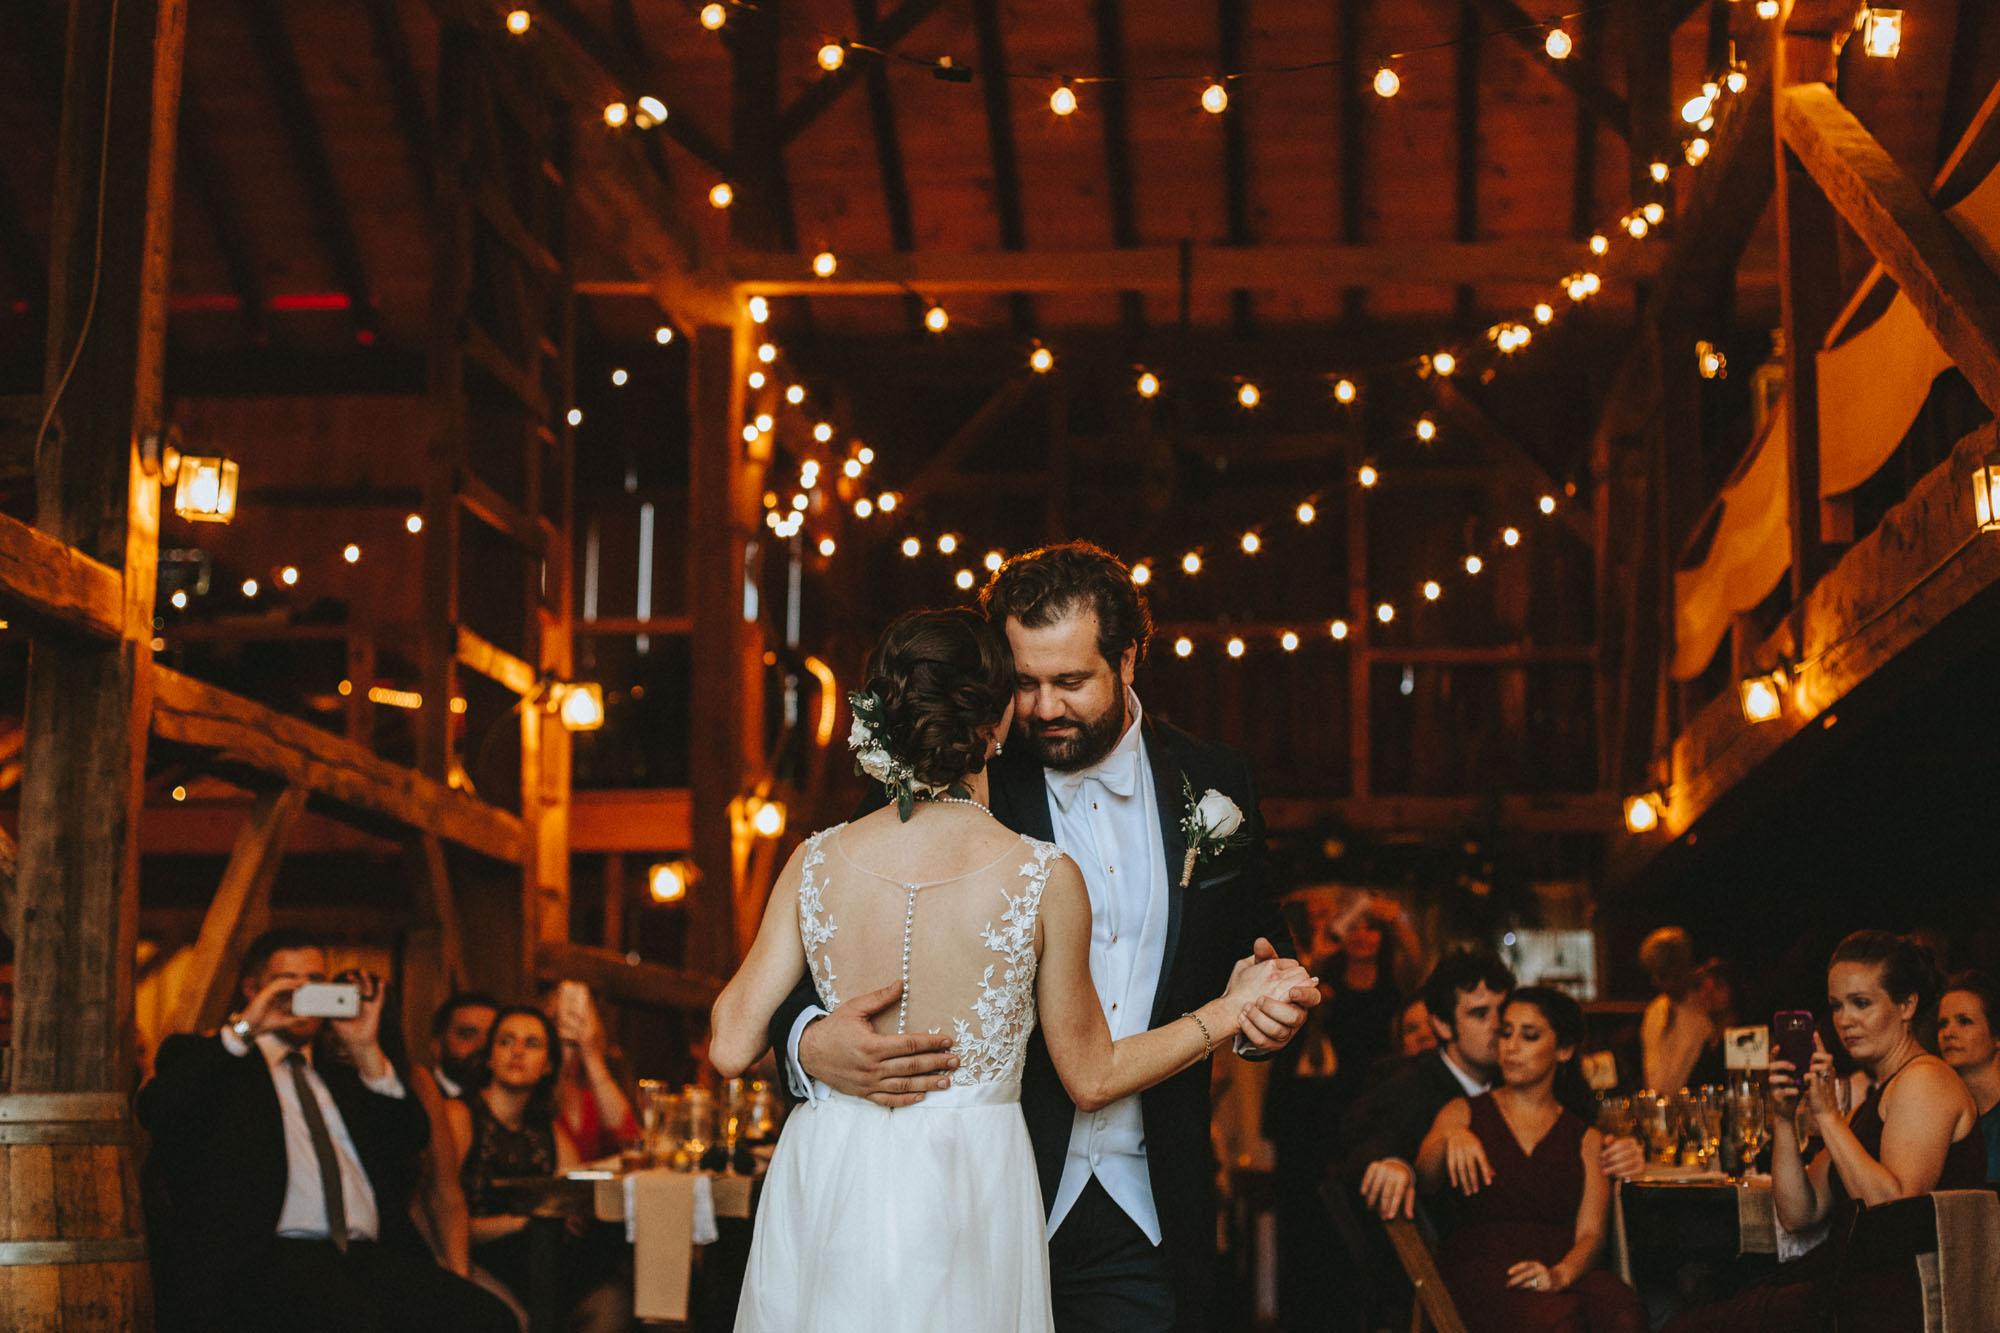 Twisted-Oaks-Studio-Arianne-Sean-Wedding-434.jpg